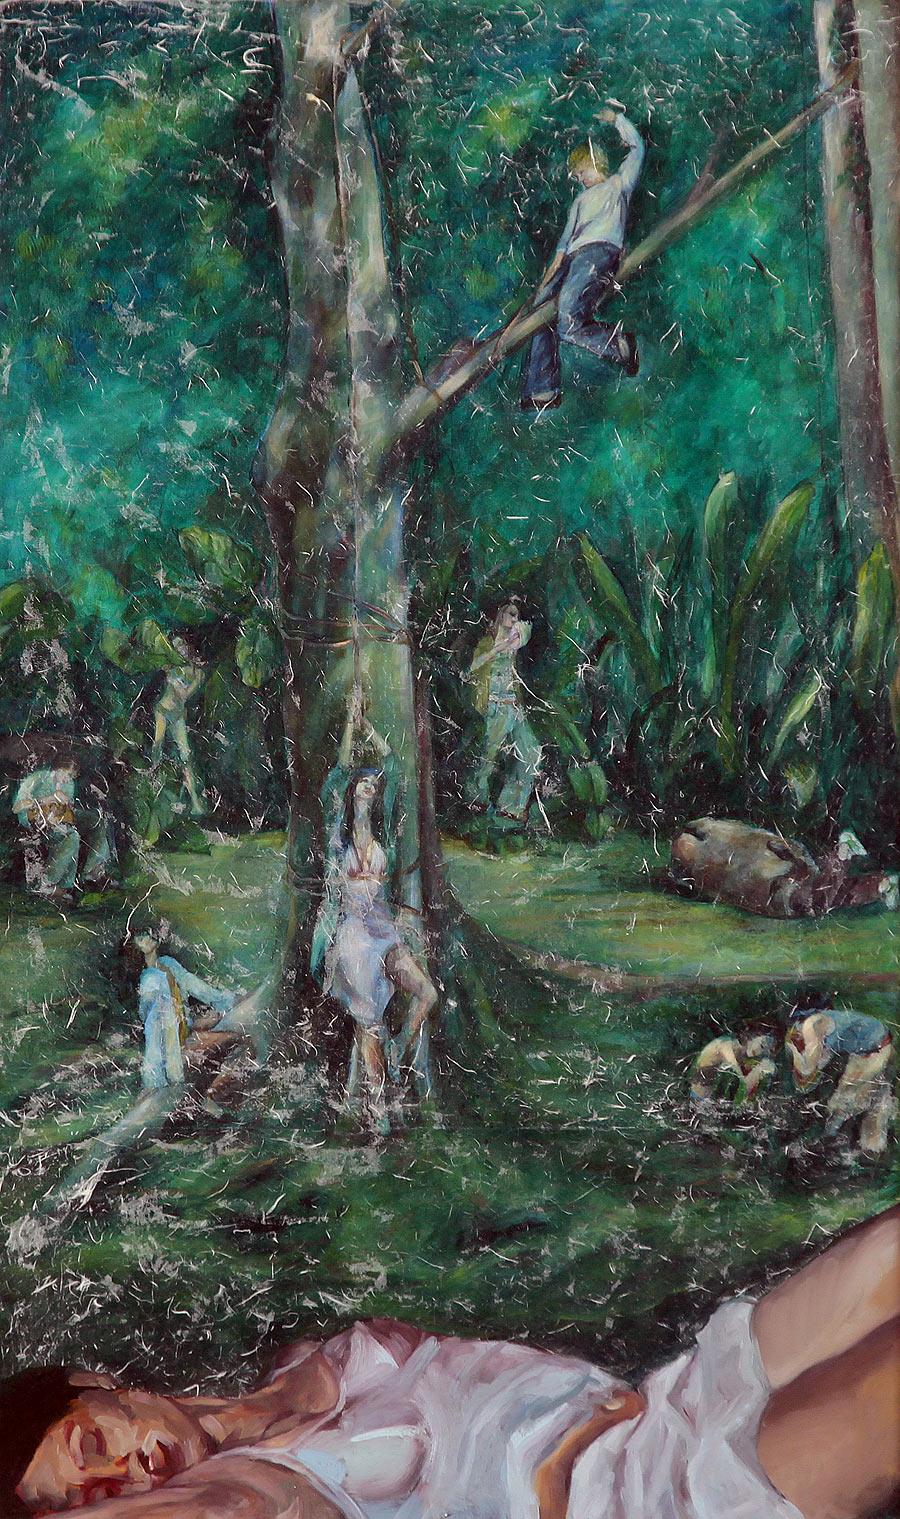 María del Pilar Benavides Muñoz - Óleo sobre lienzo - 150x90 cm